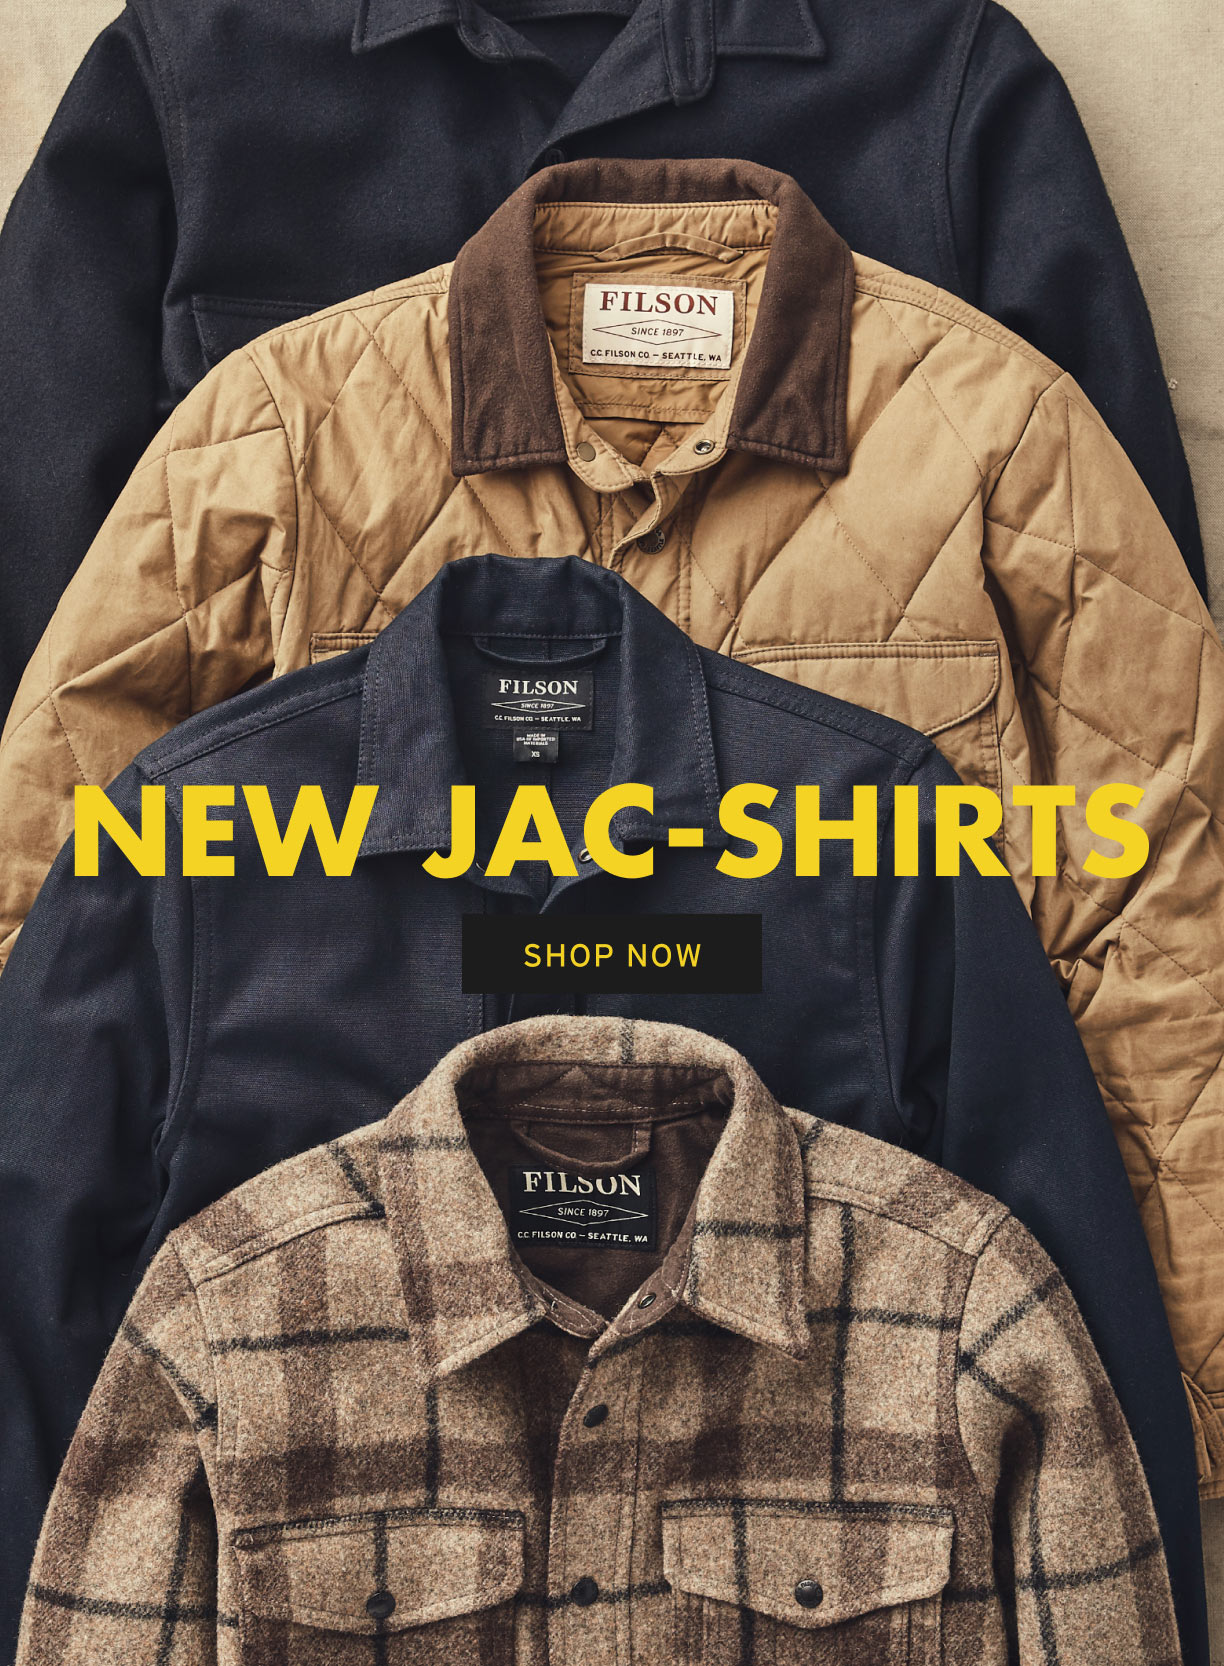 SHOP JAC-SHIRTS